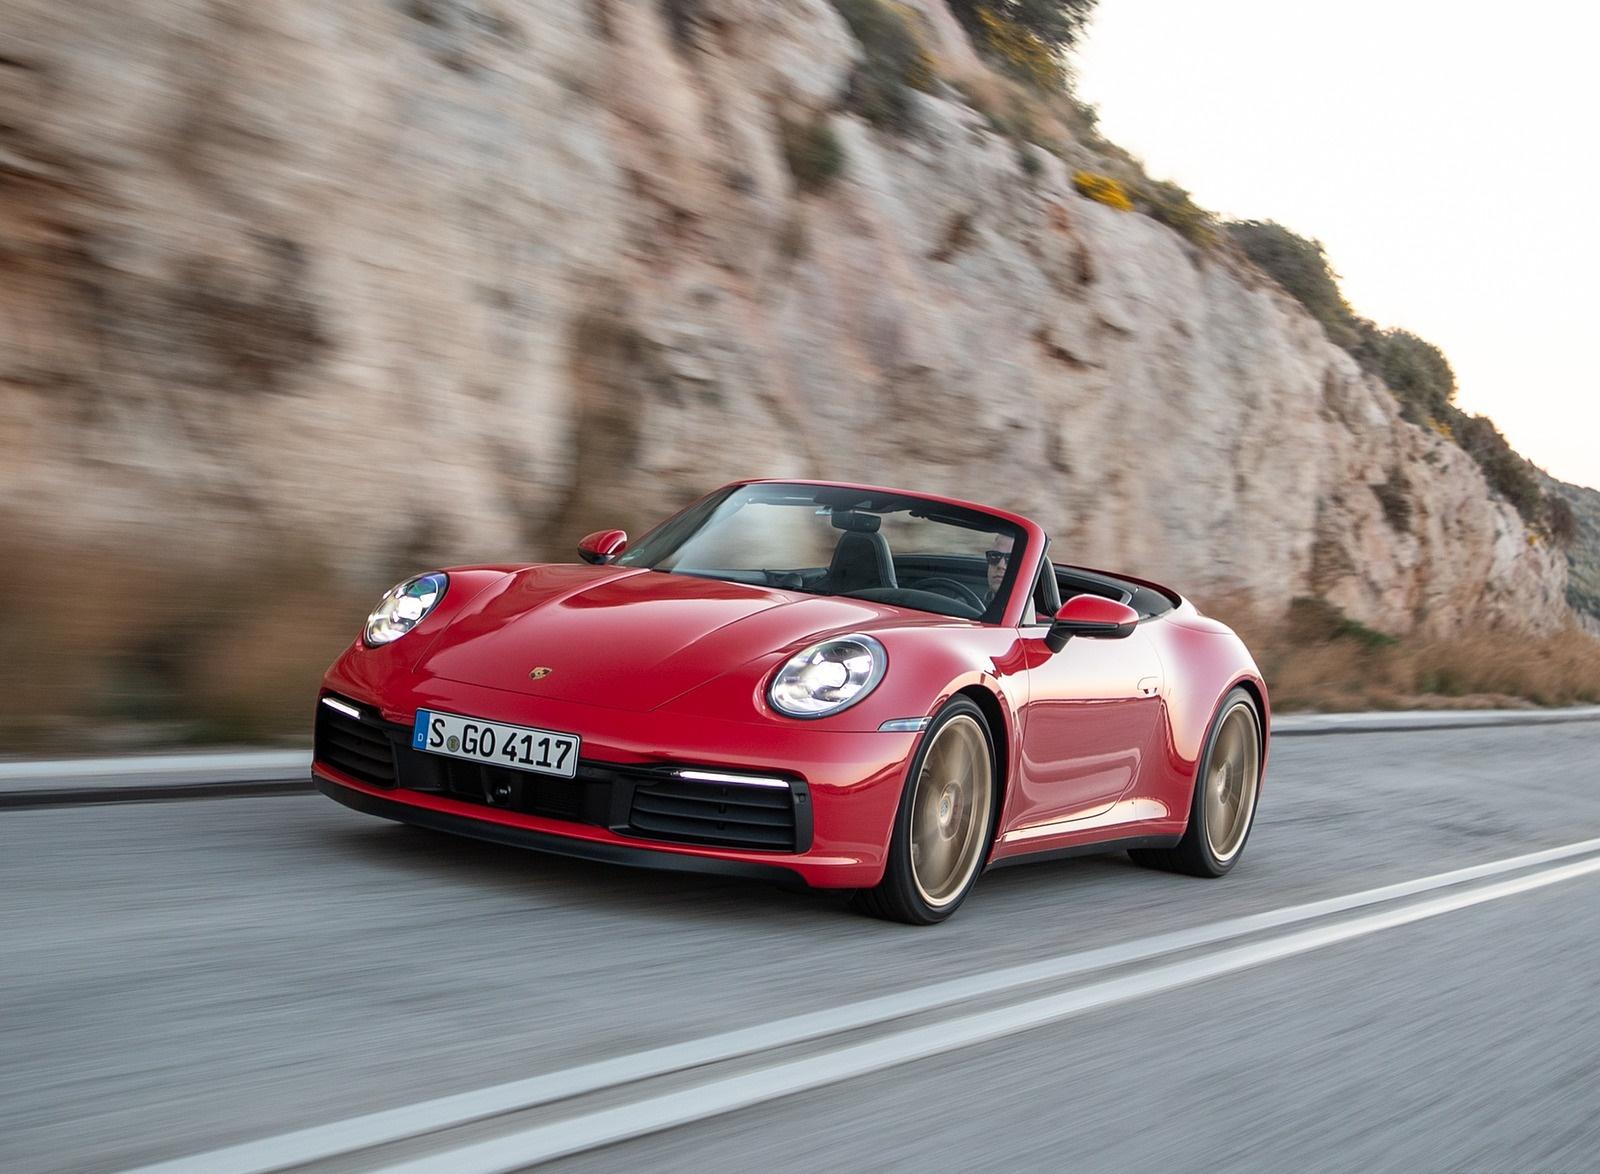 2020 Porsche 911 Carrera 4S Cabriolet Color India Red Front 1600x1174